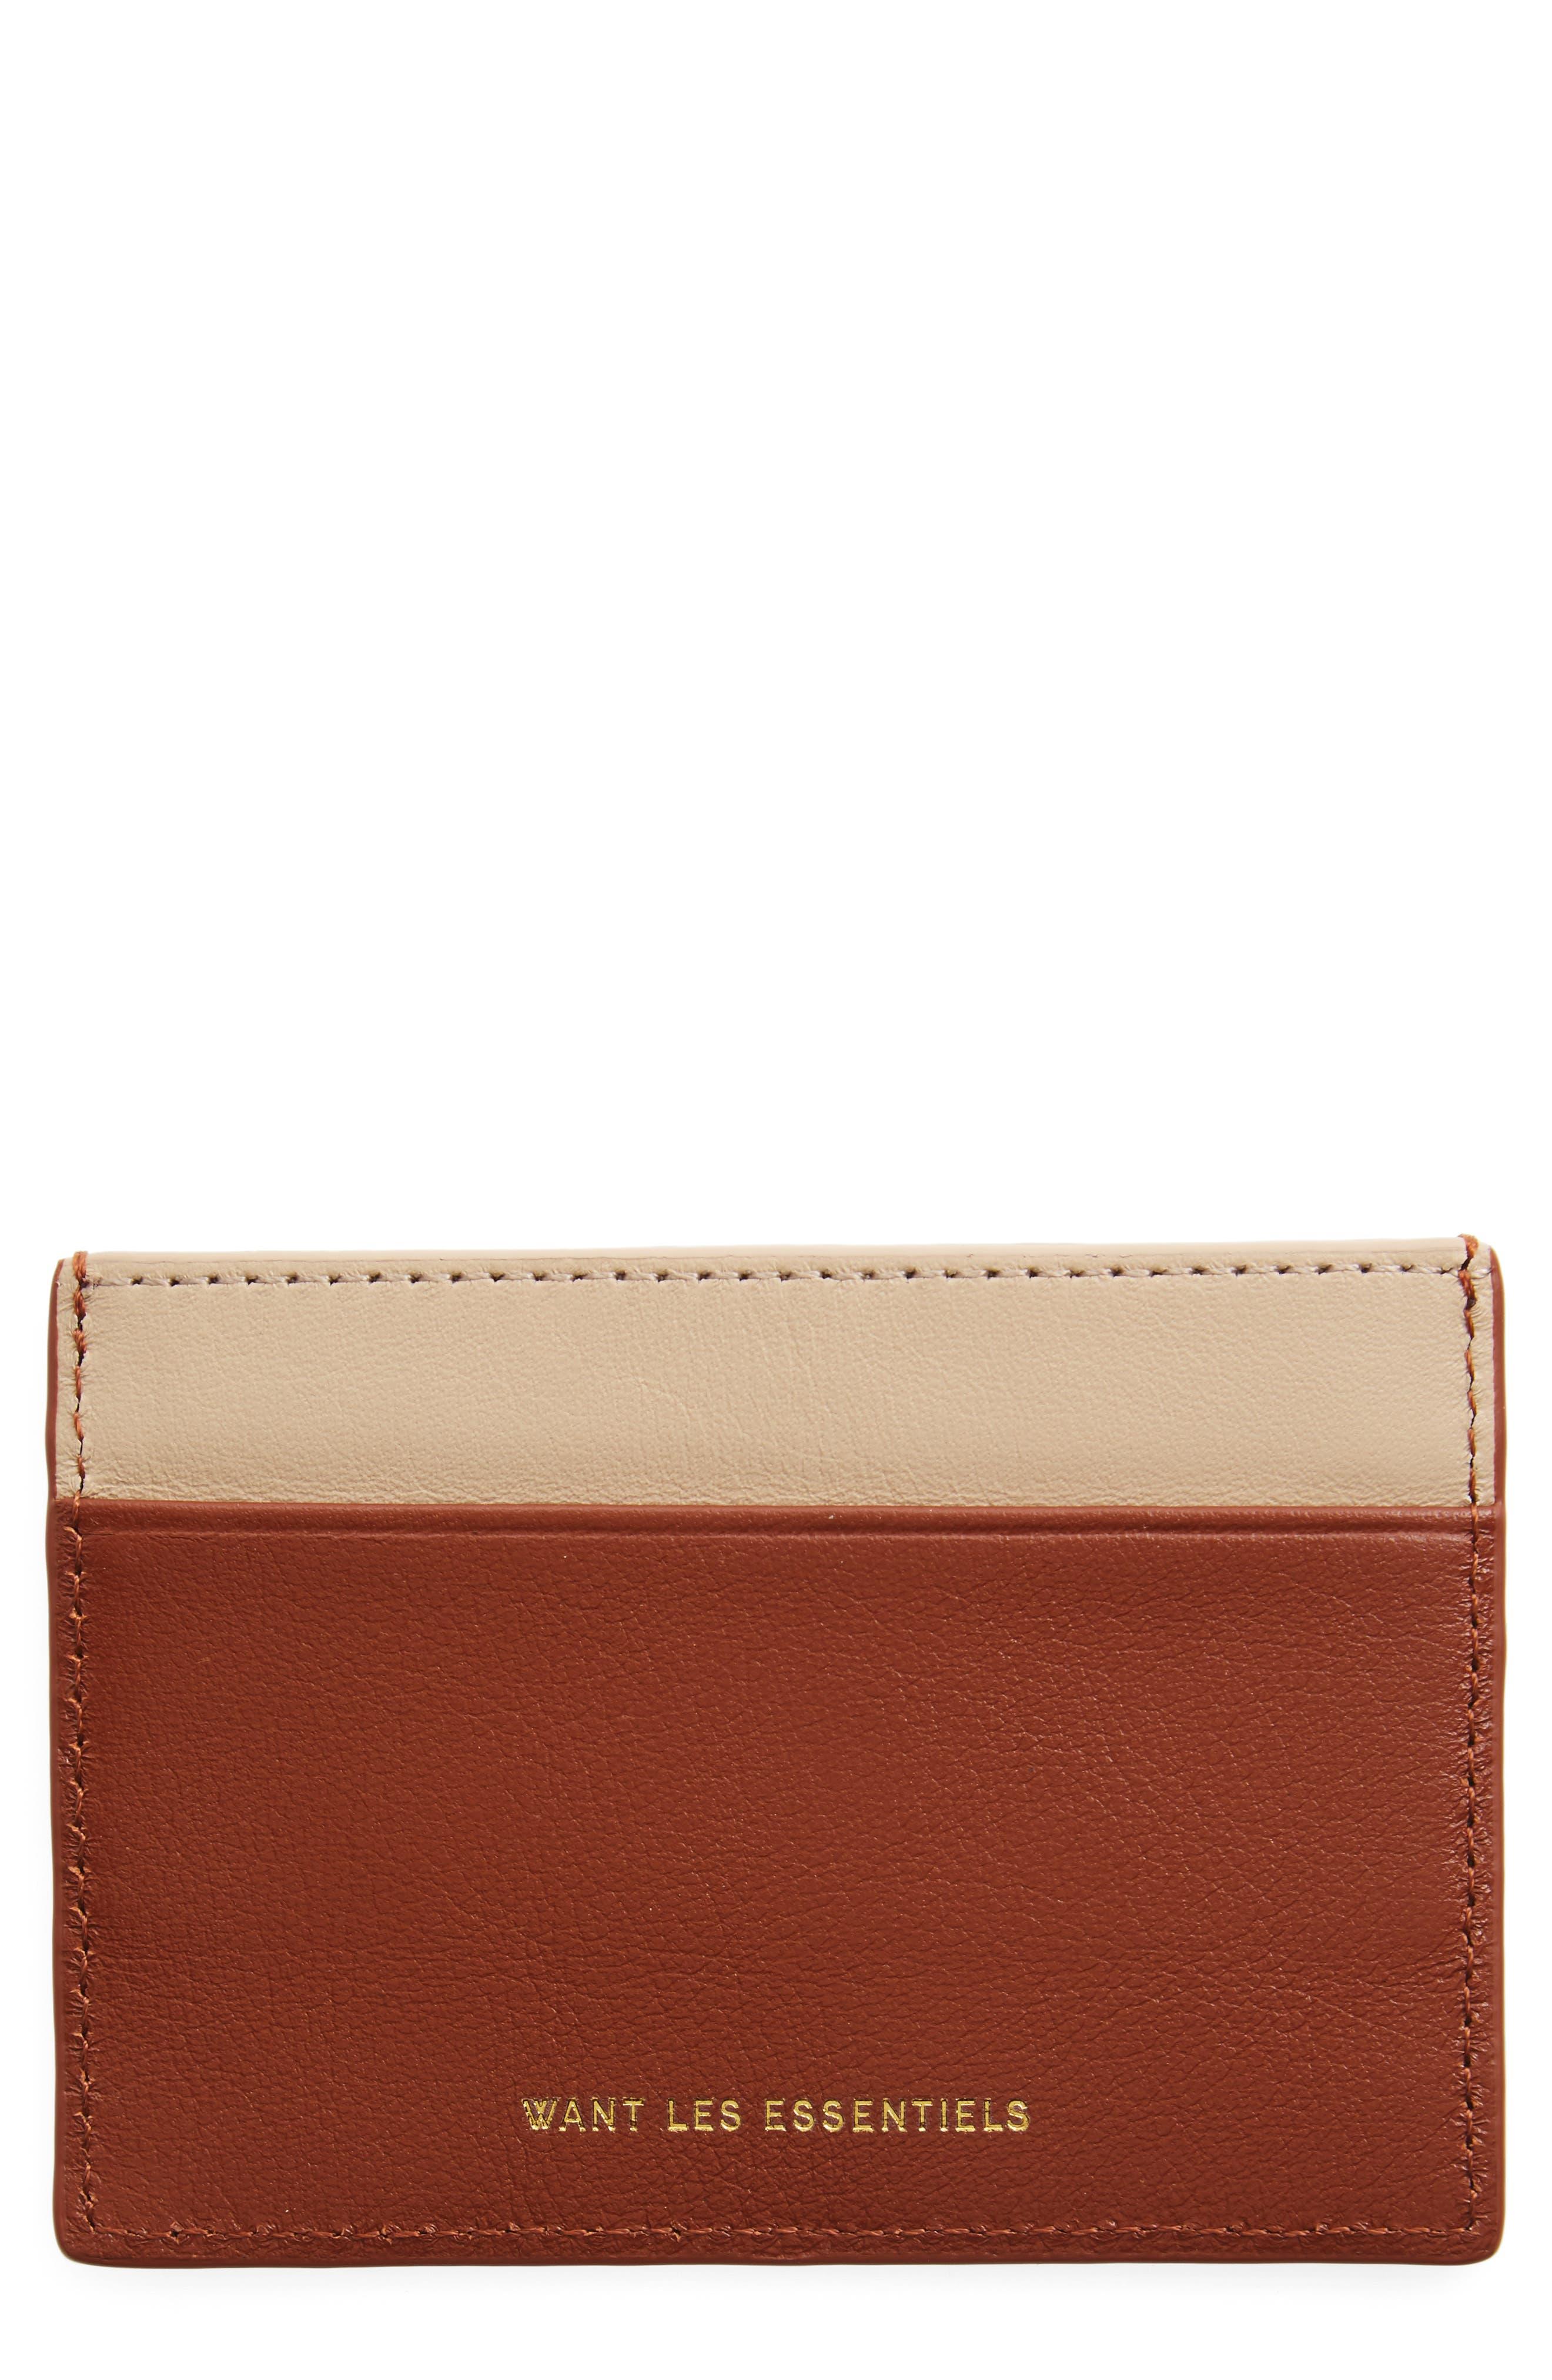 WANT LES ESSENTIELS,                             Branson Leather Card,                             Main thumbnail 1, color,                             212